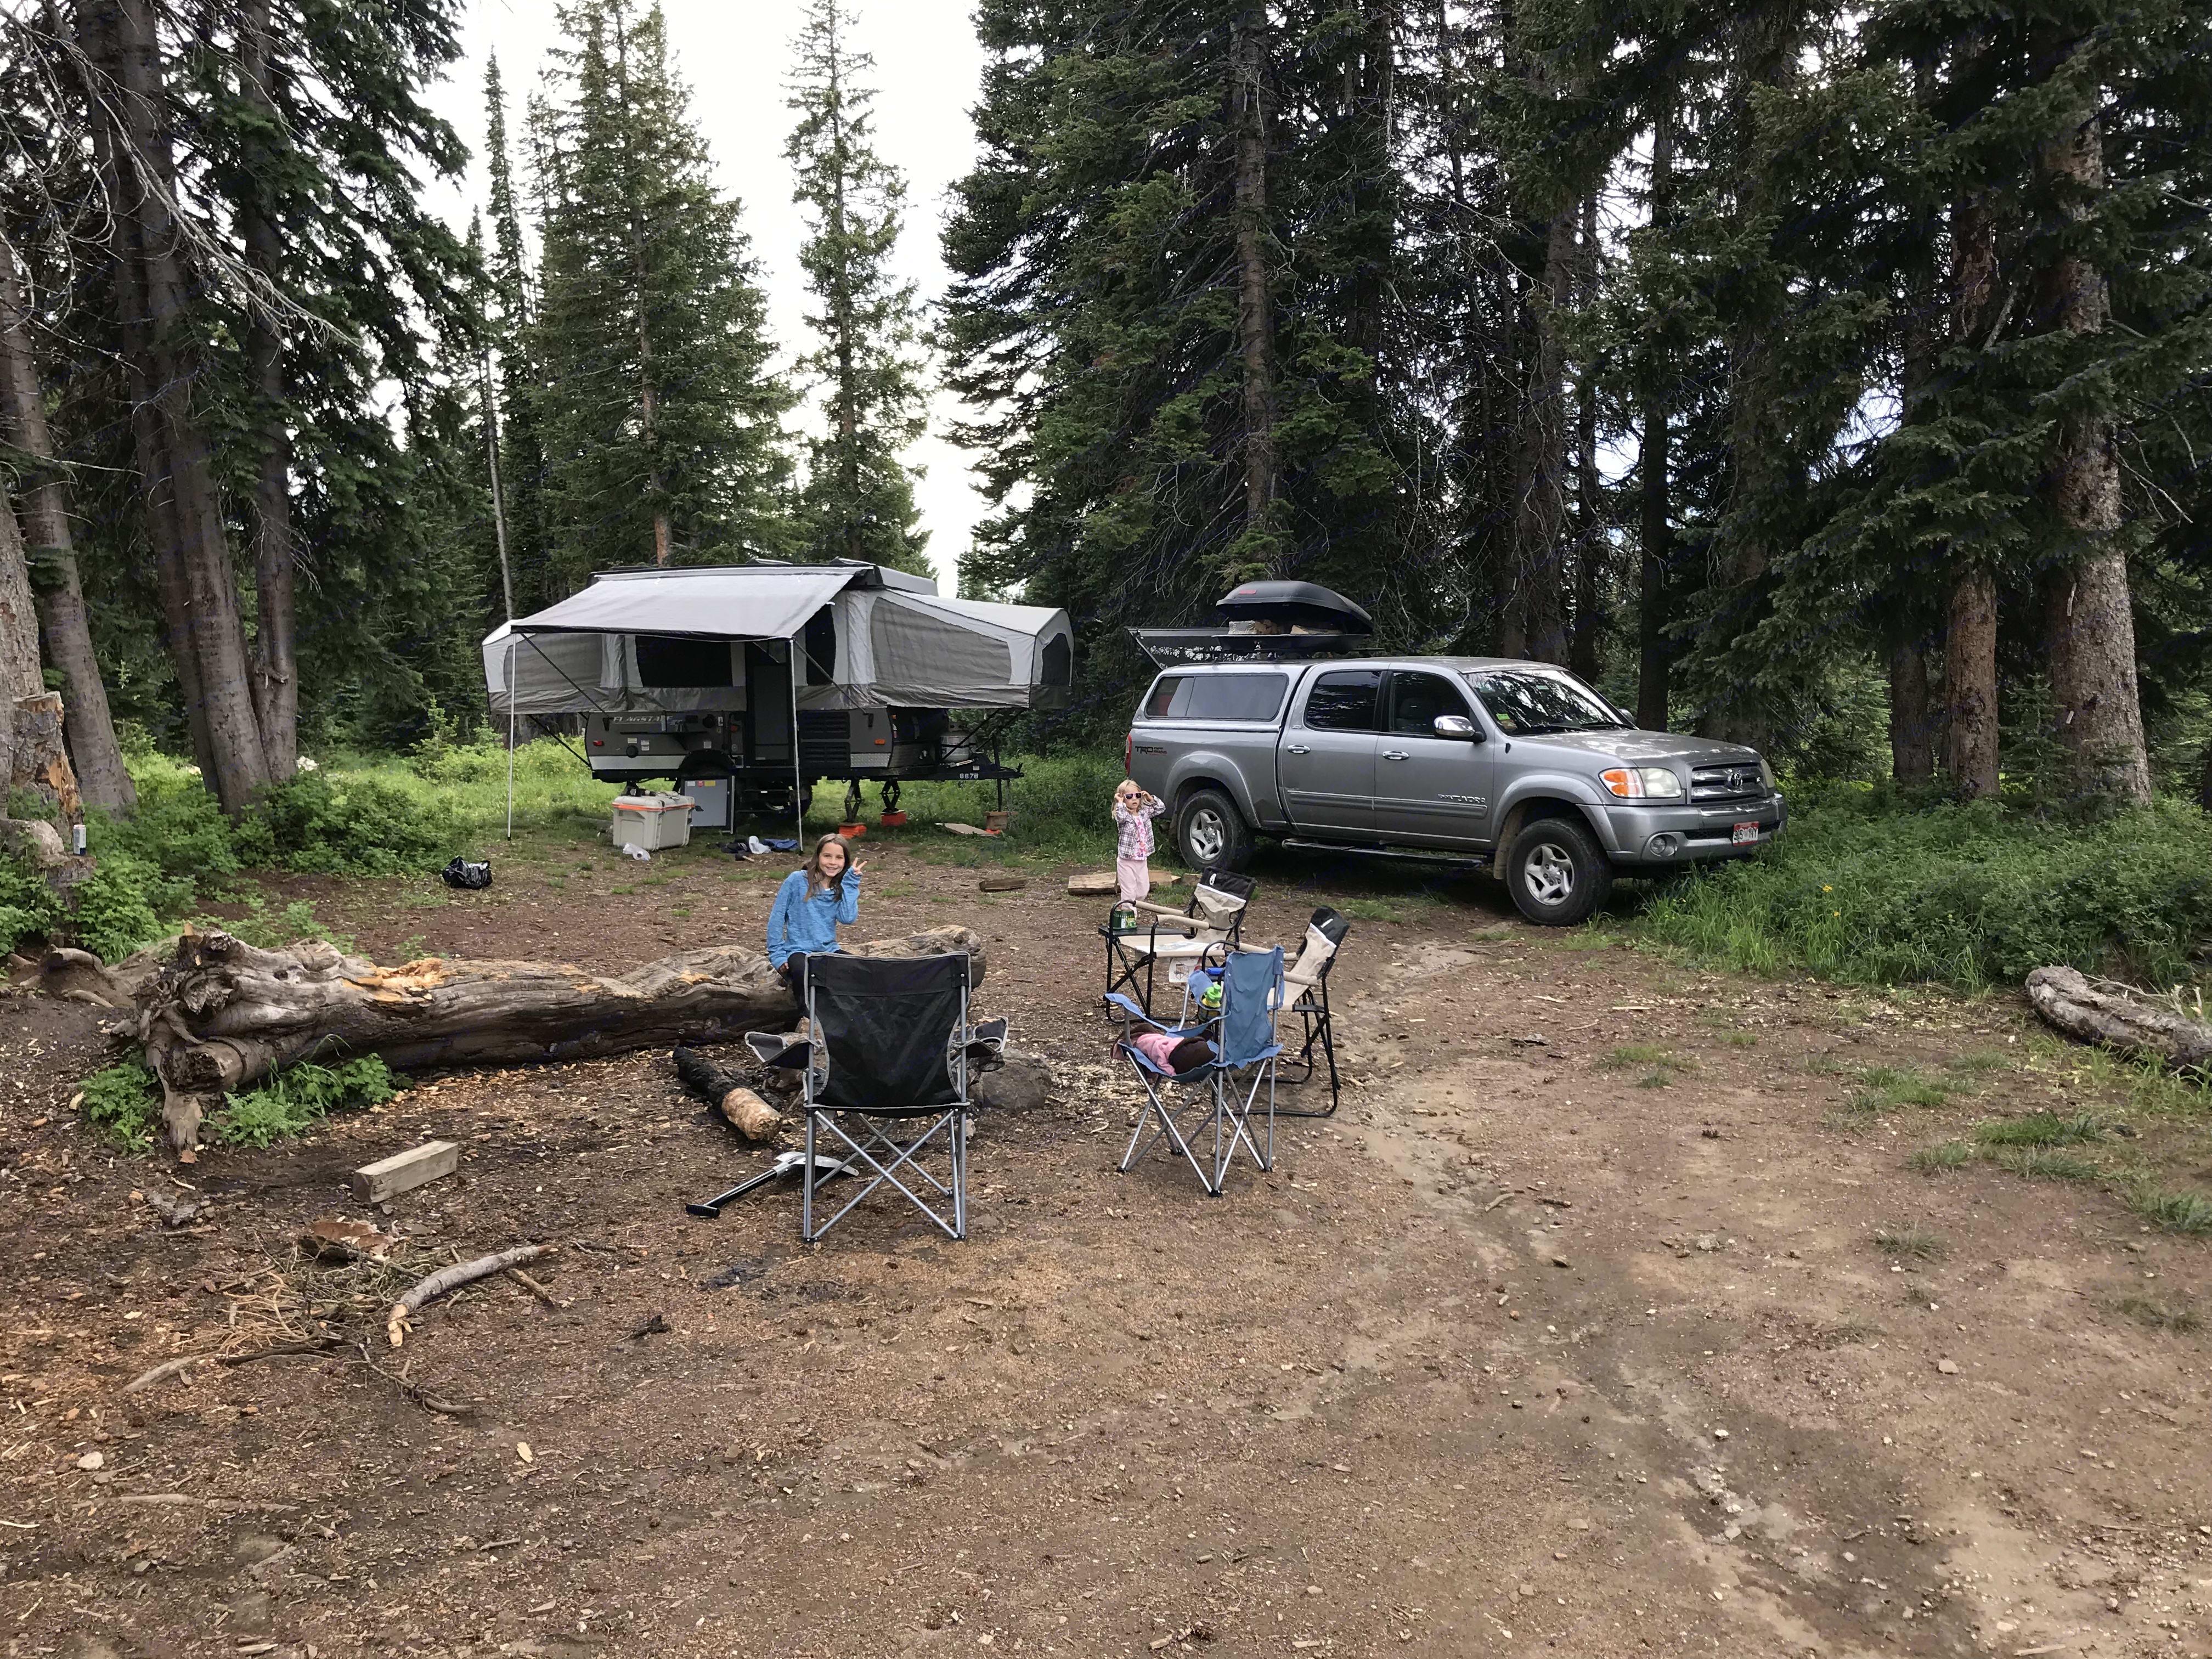 Summer. ForestRiver Flagstaff 2018